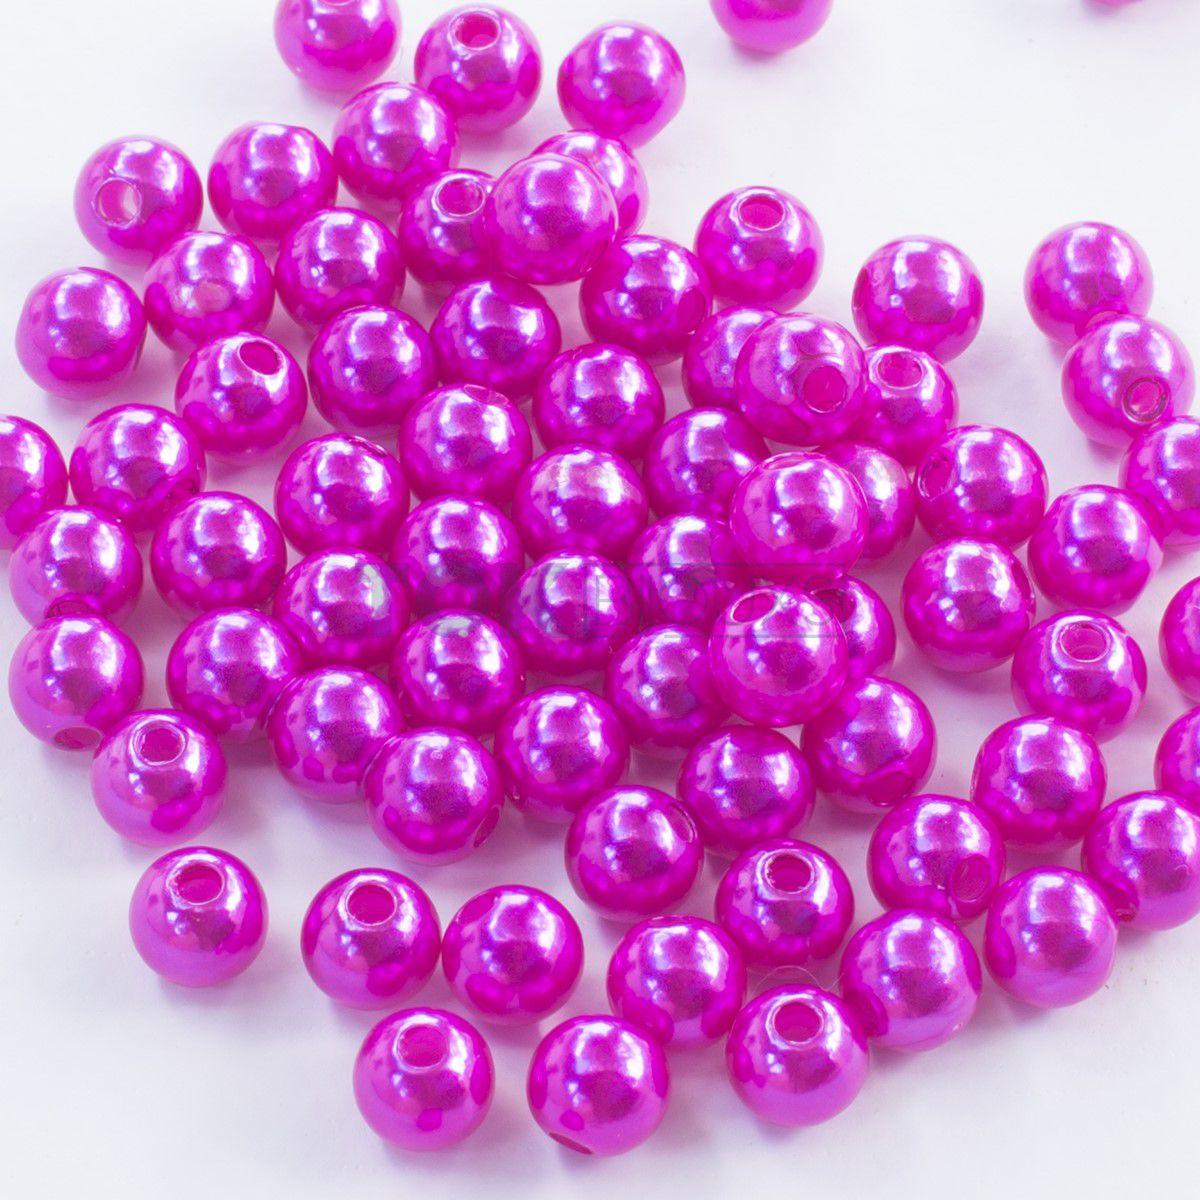 Pérola Redonda Abs 4mm - Pink - 250g